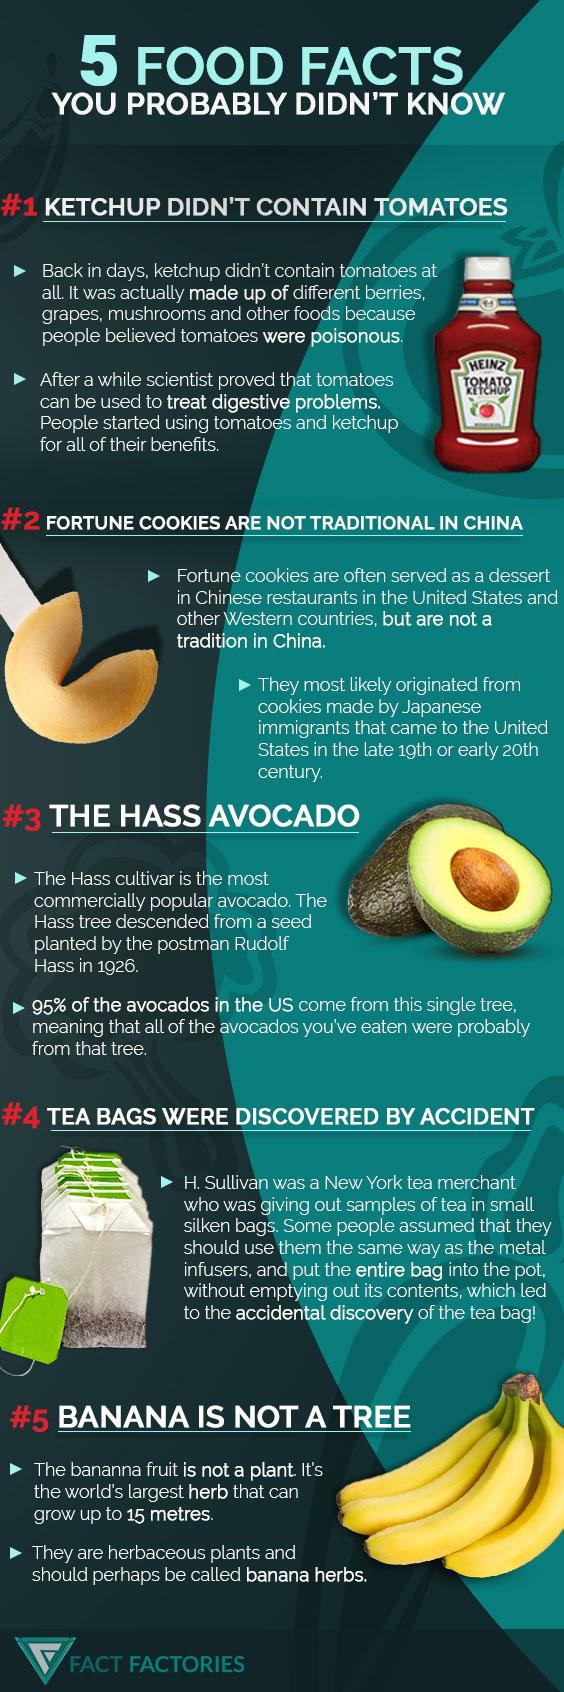 5 Food Facts - weird facts